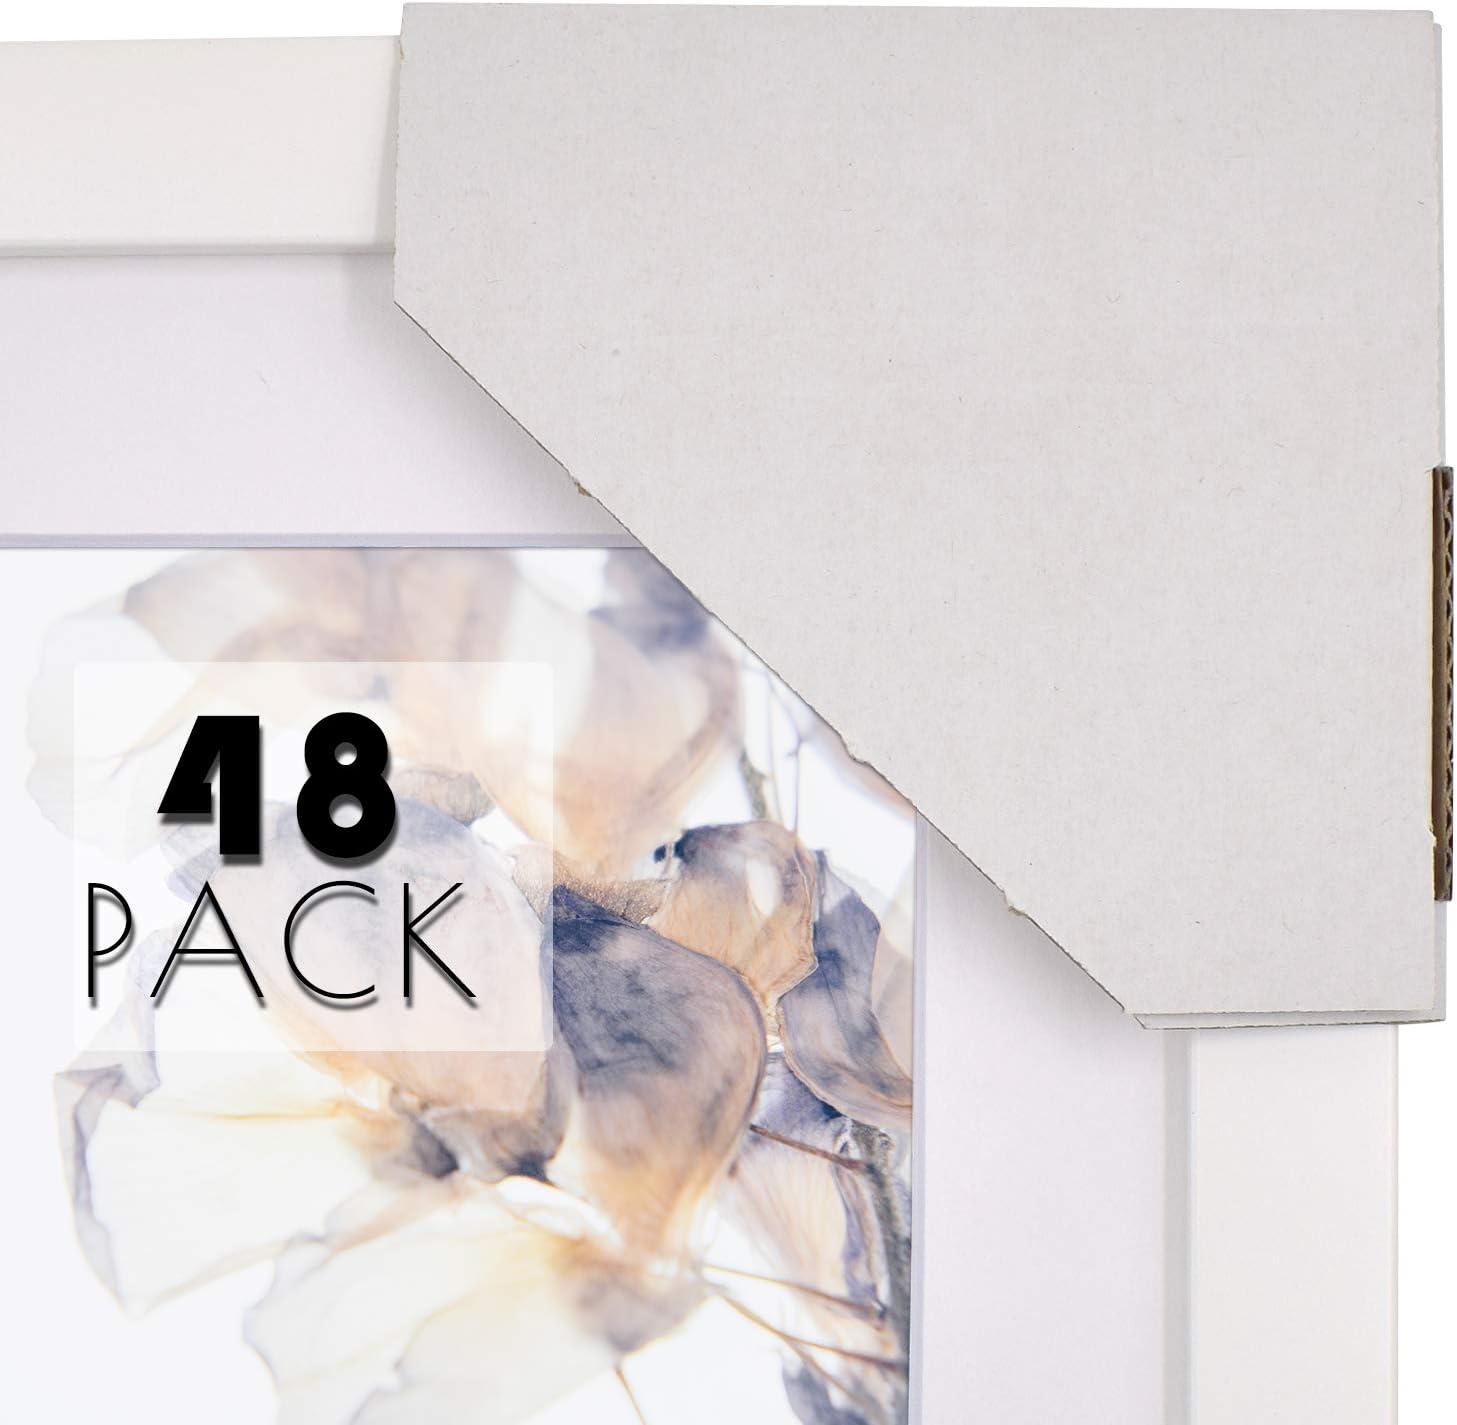 Presentations Invitations Printable Aquamarine Metallic 13 x 19 Cardstock Text Weight Scrapbooking 1319-C-M02-50 | Perfect for Crafting 105lb 50 Qty. 13x19 Photos